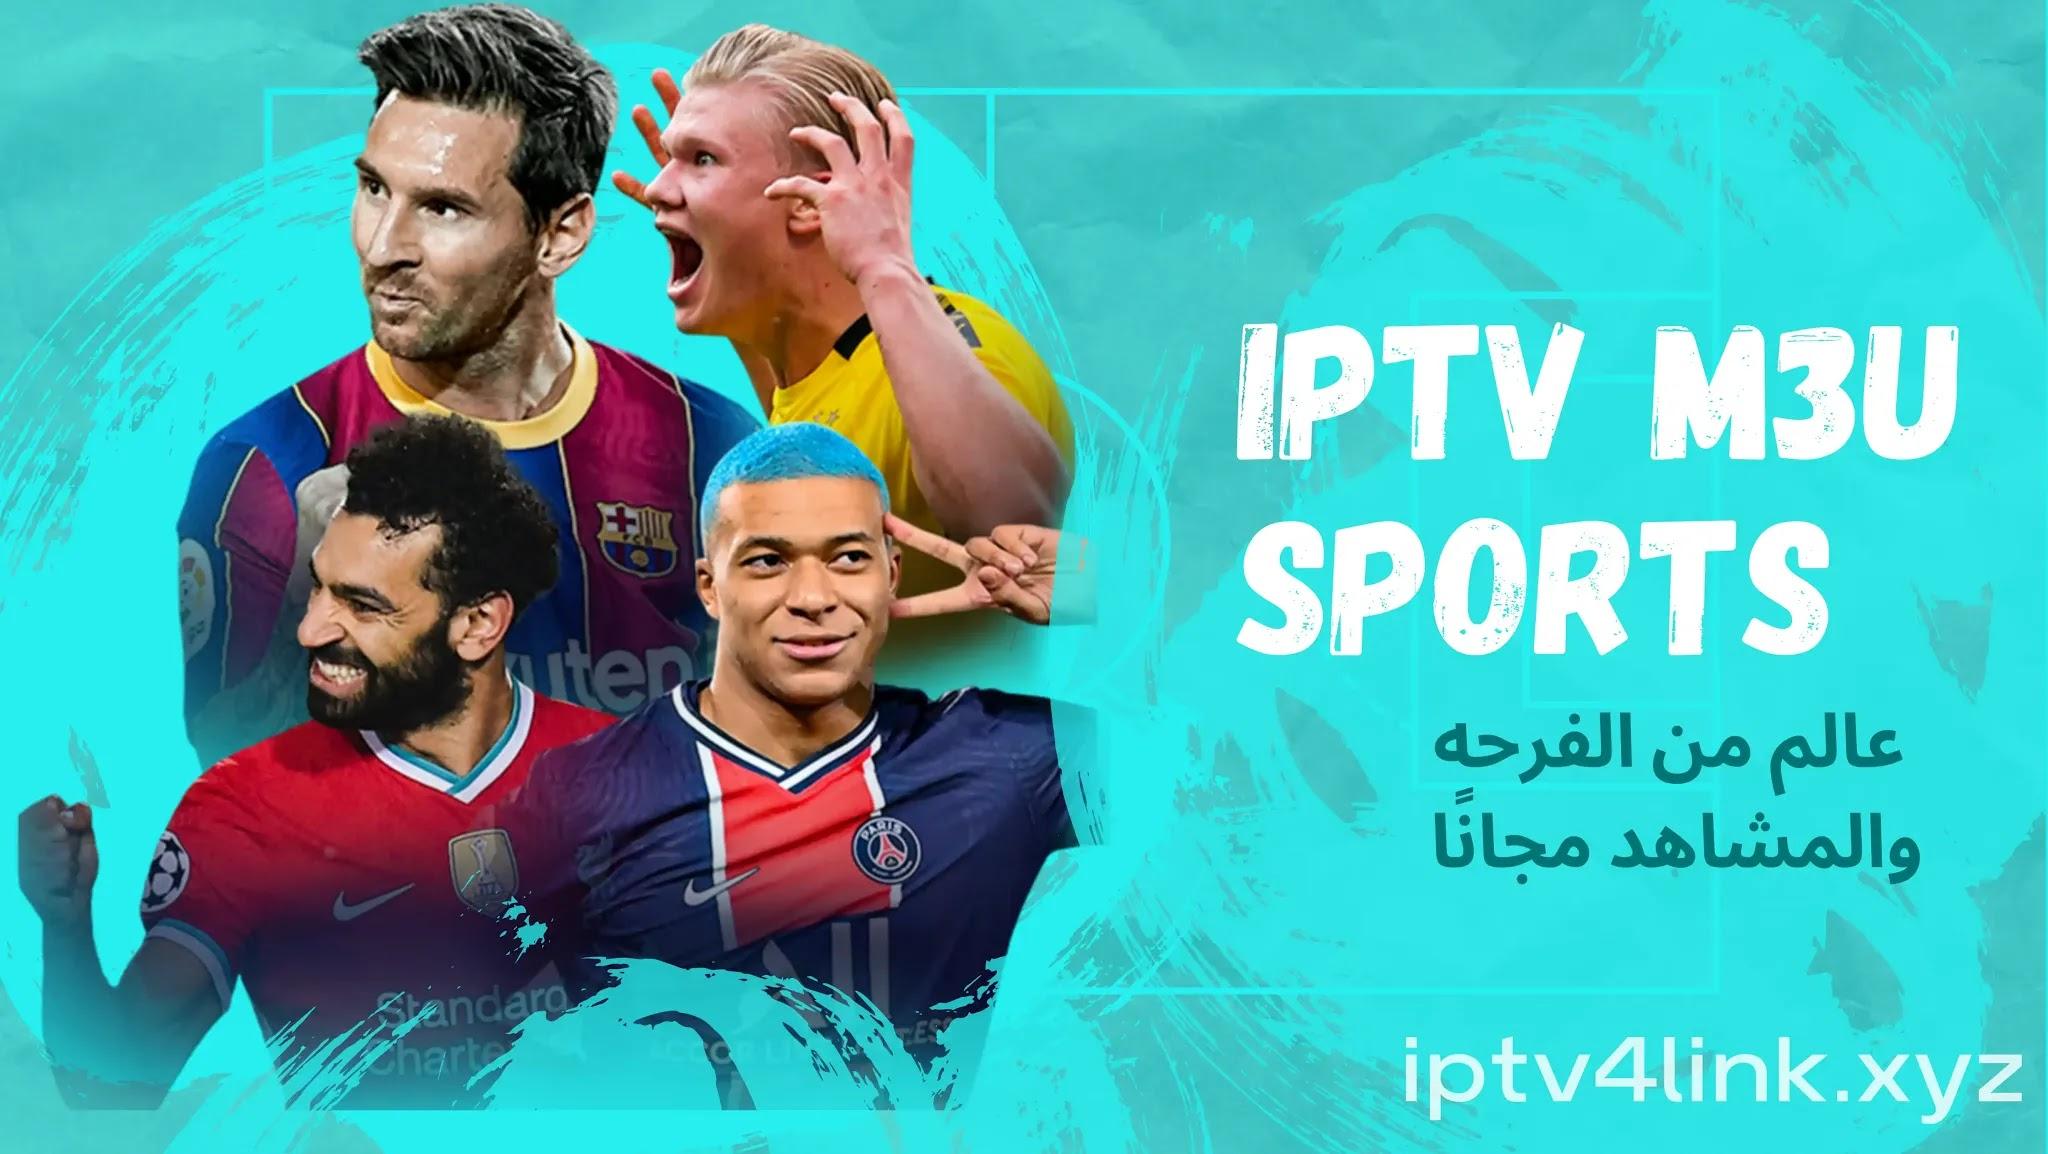 iptv bein sports m3u  2021مشاهدة مباريات اليوم :